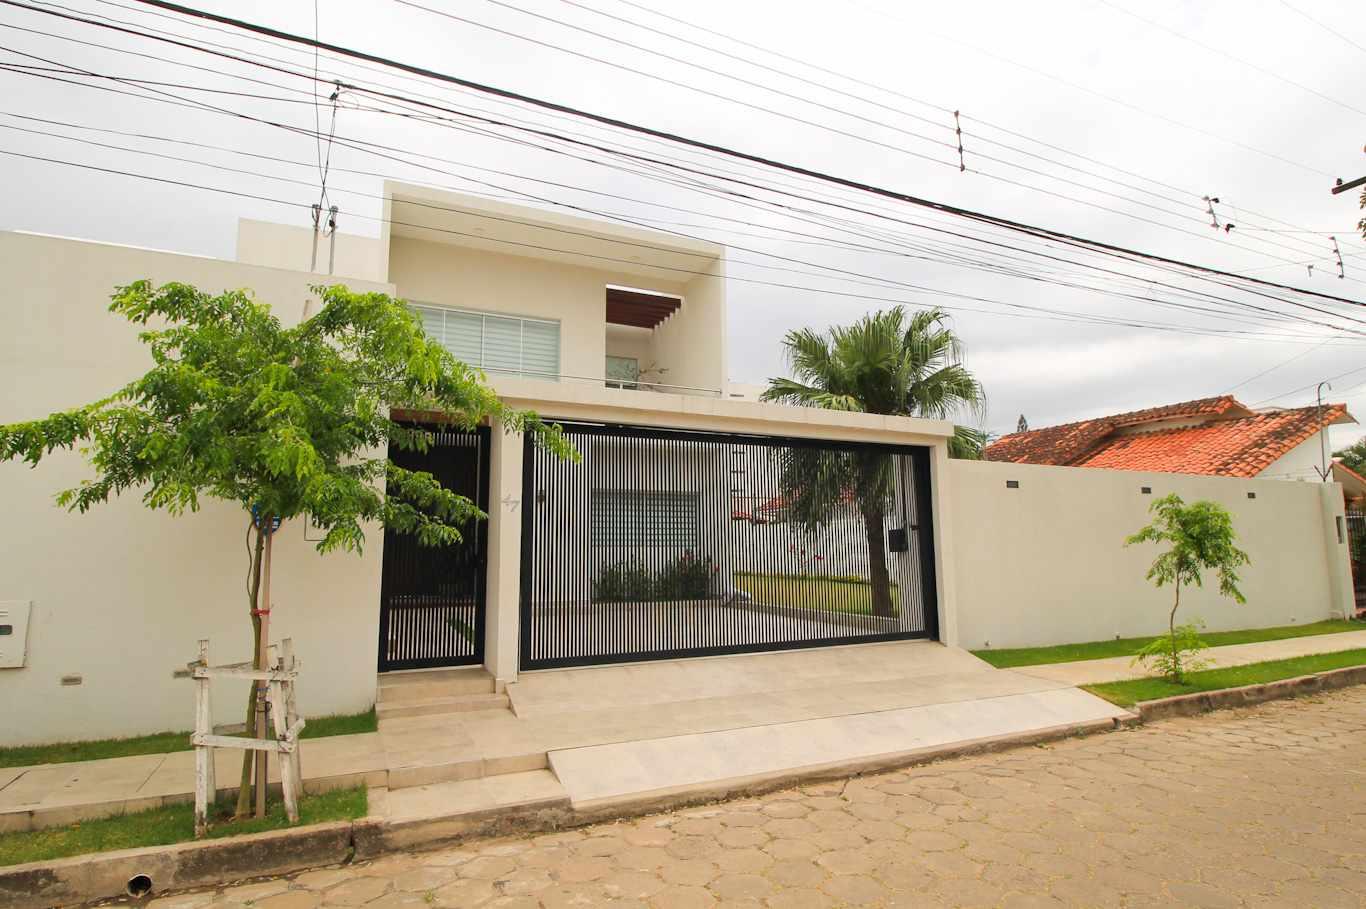 Casa en Alquiler Calle Chituri #41 Foto 1